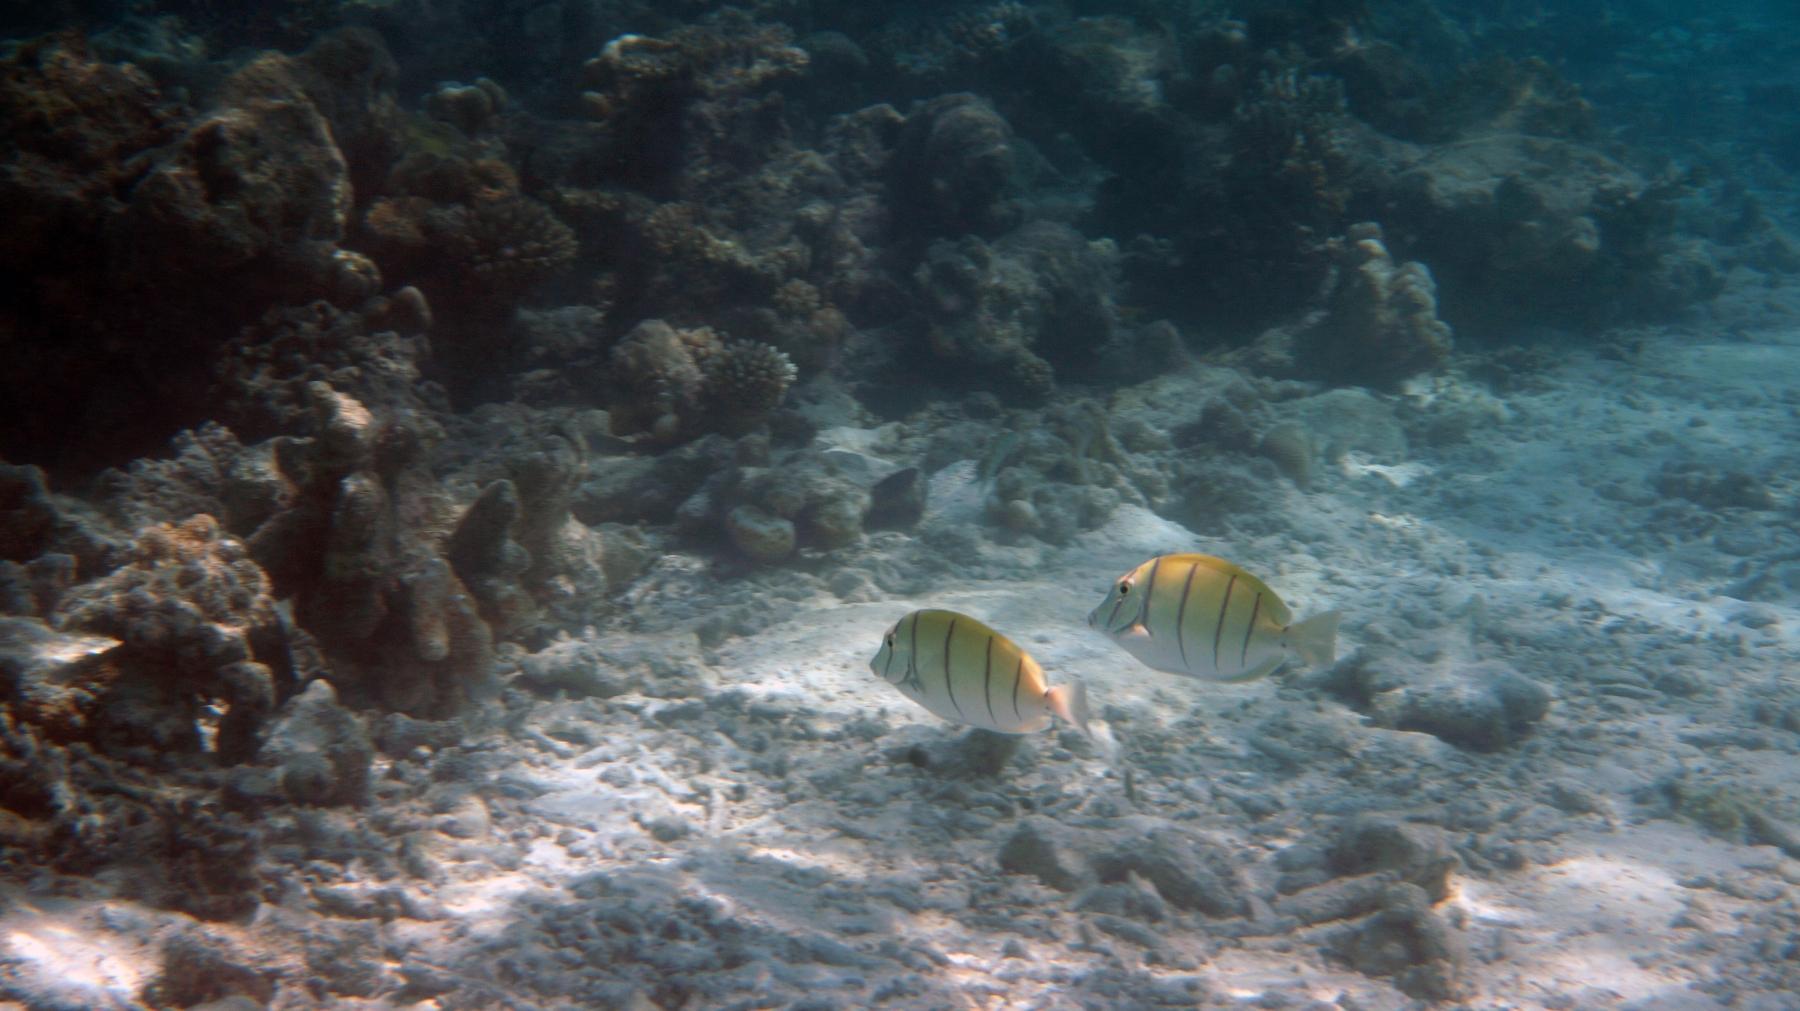 Acanthurus_triostegus_010_C_Peces-Cirujano_L_Maldivas_U_Sebas_03072015